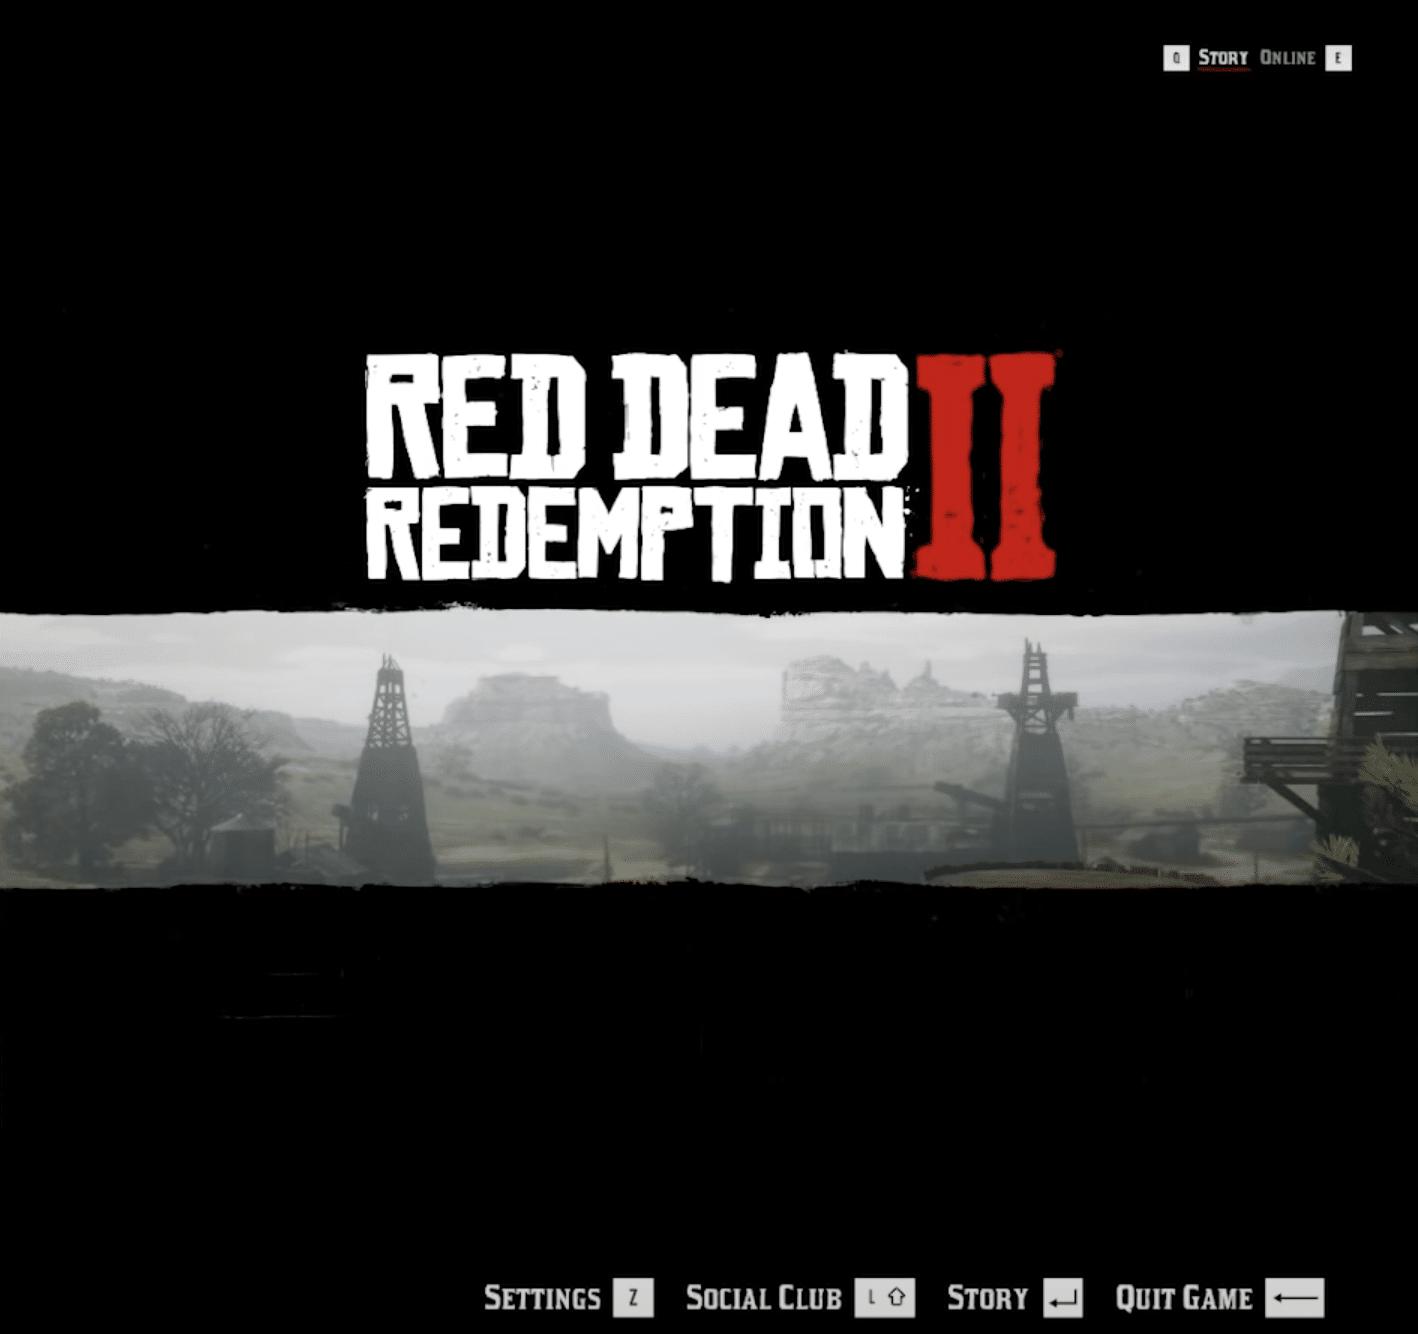 7 - red dead redemption vr mod - splash screen